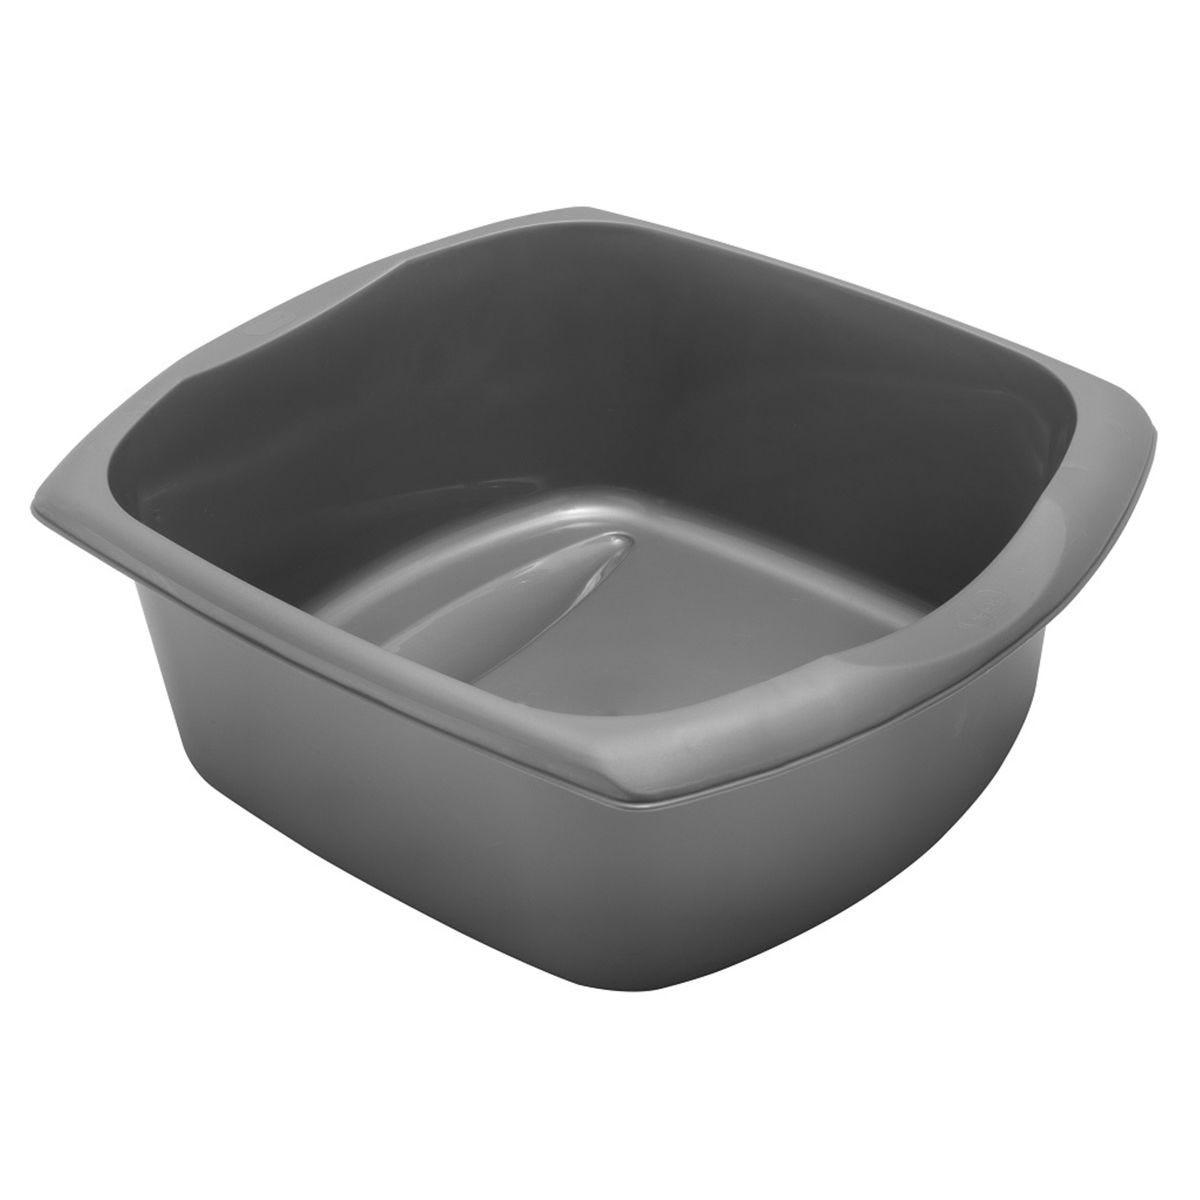 Addis Large Washing Up Bowl – Silver